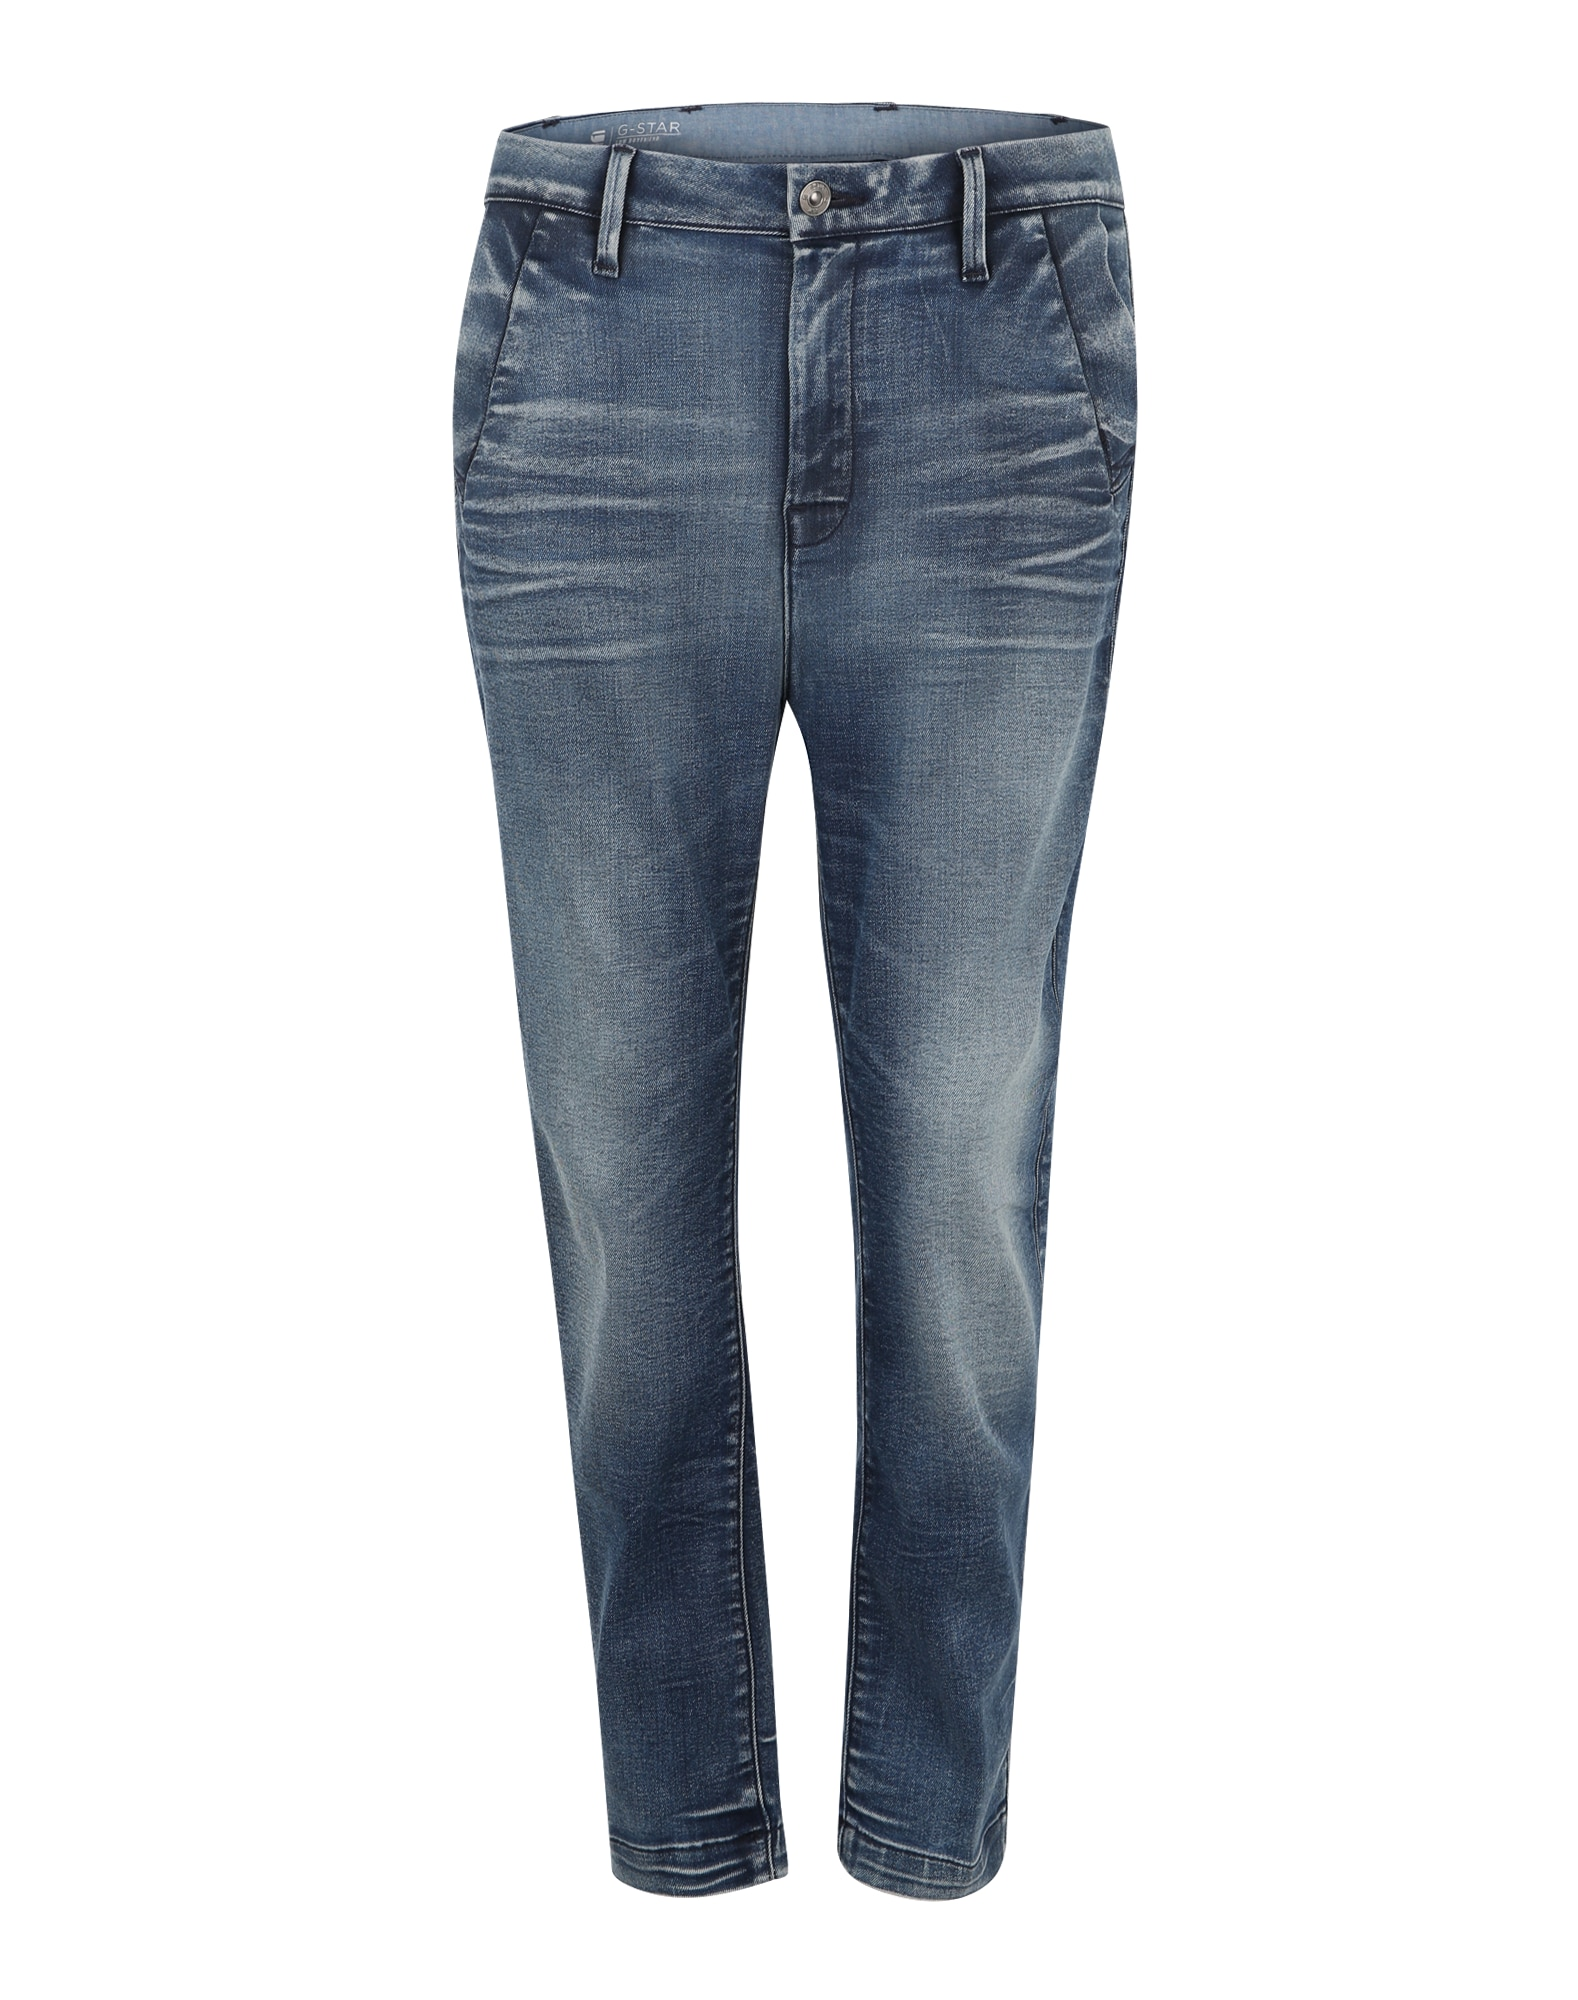 G-STAR RAW Dames Jeans Bronson Low Boyfriend donkerblauw